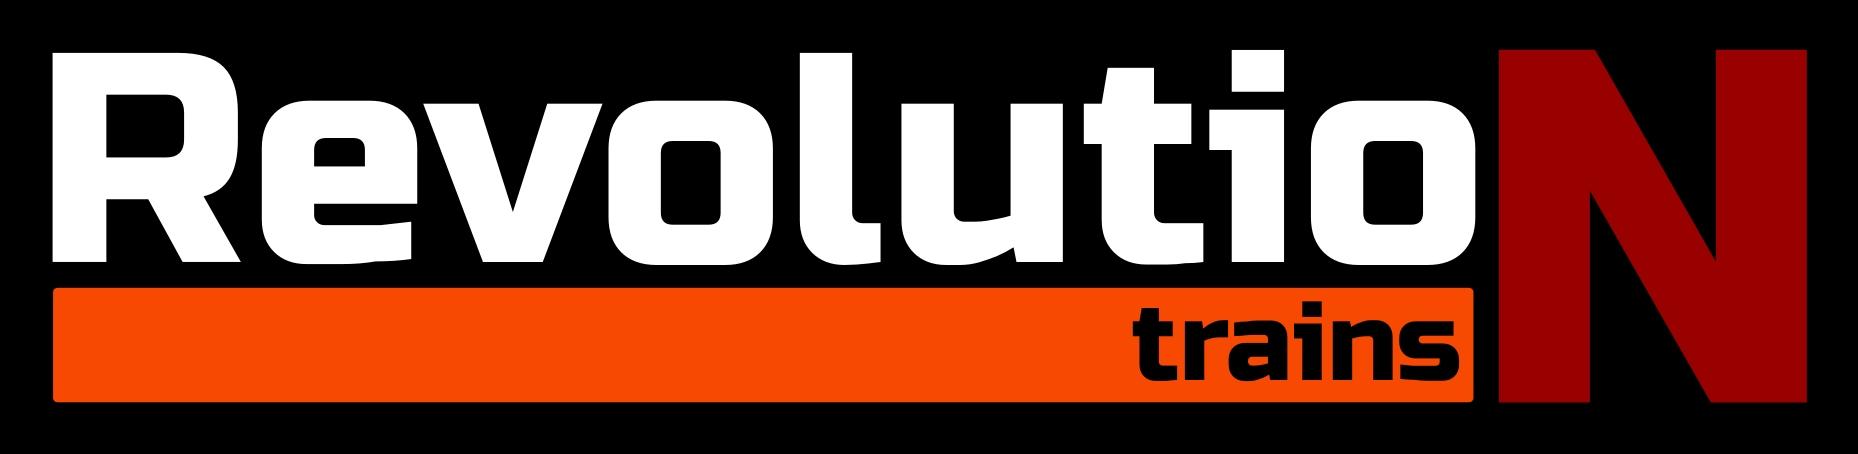 Revolution Trains logo